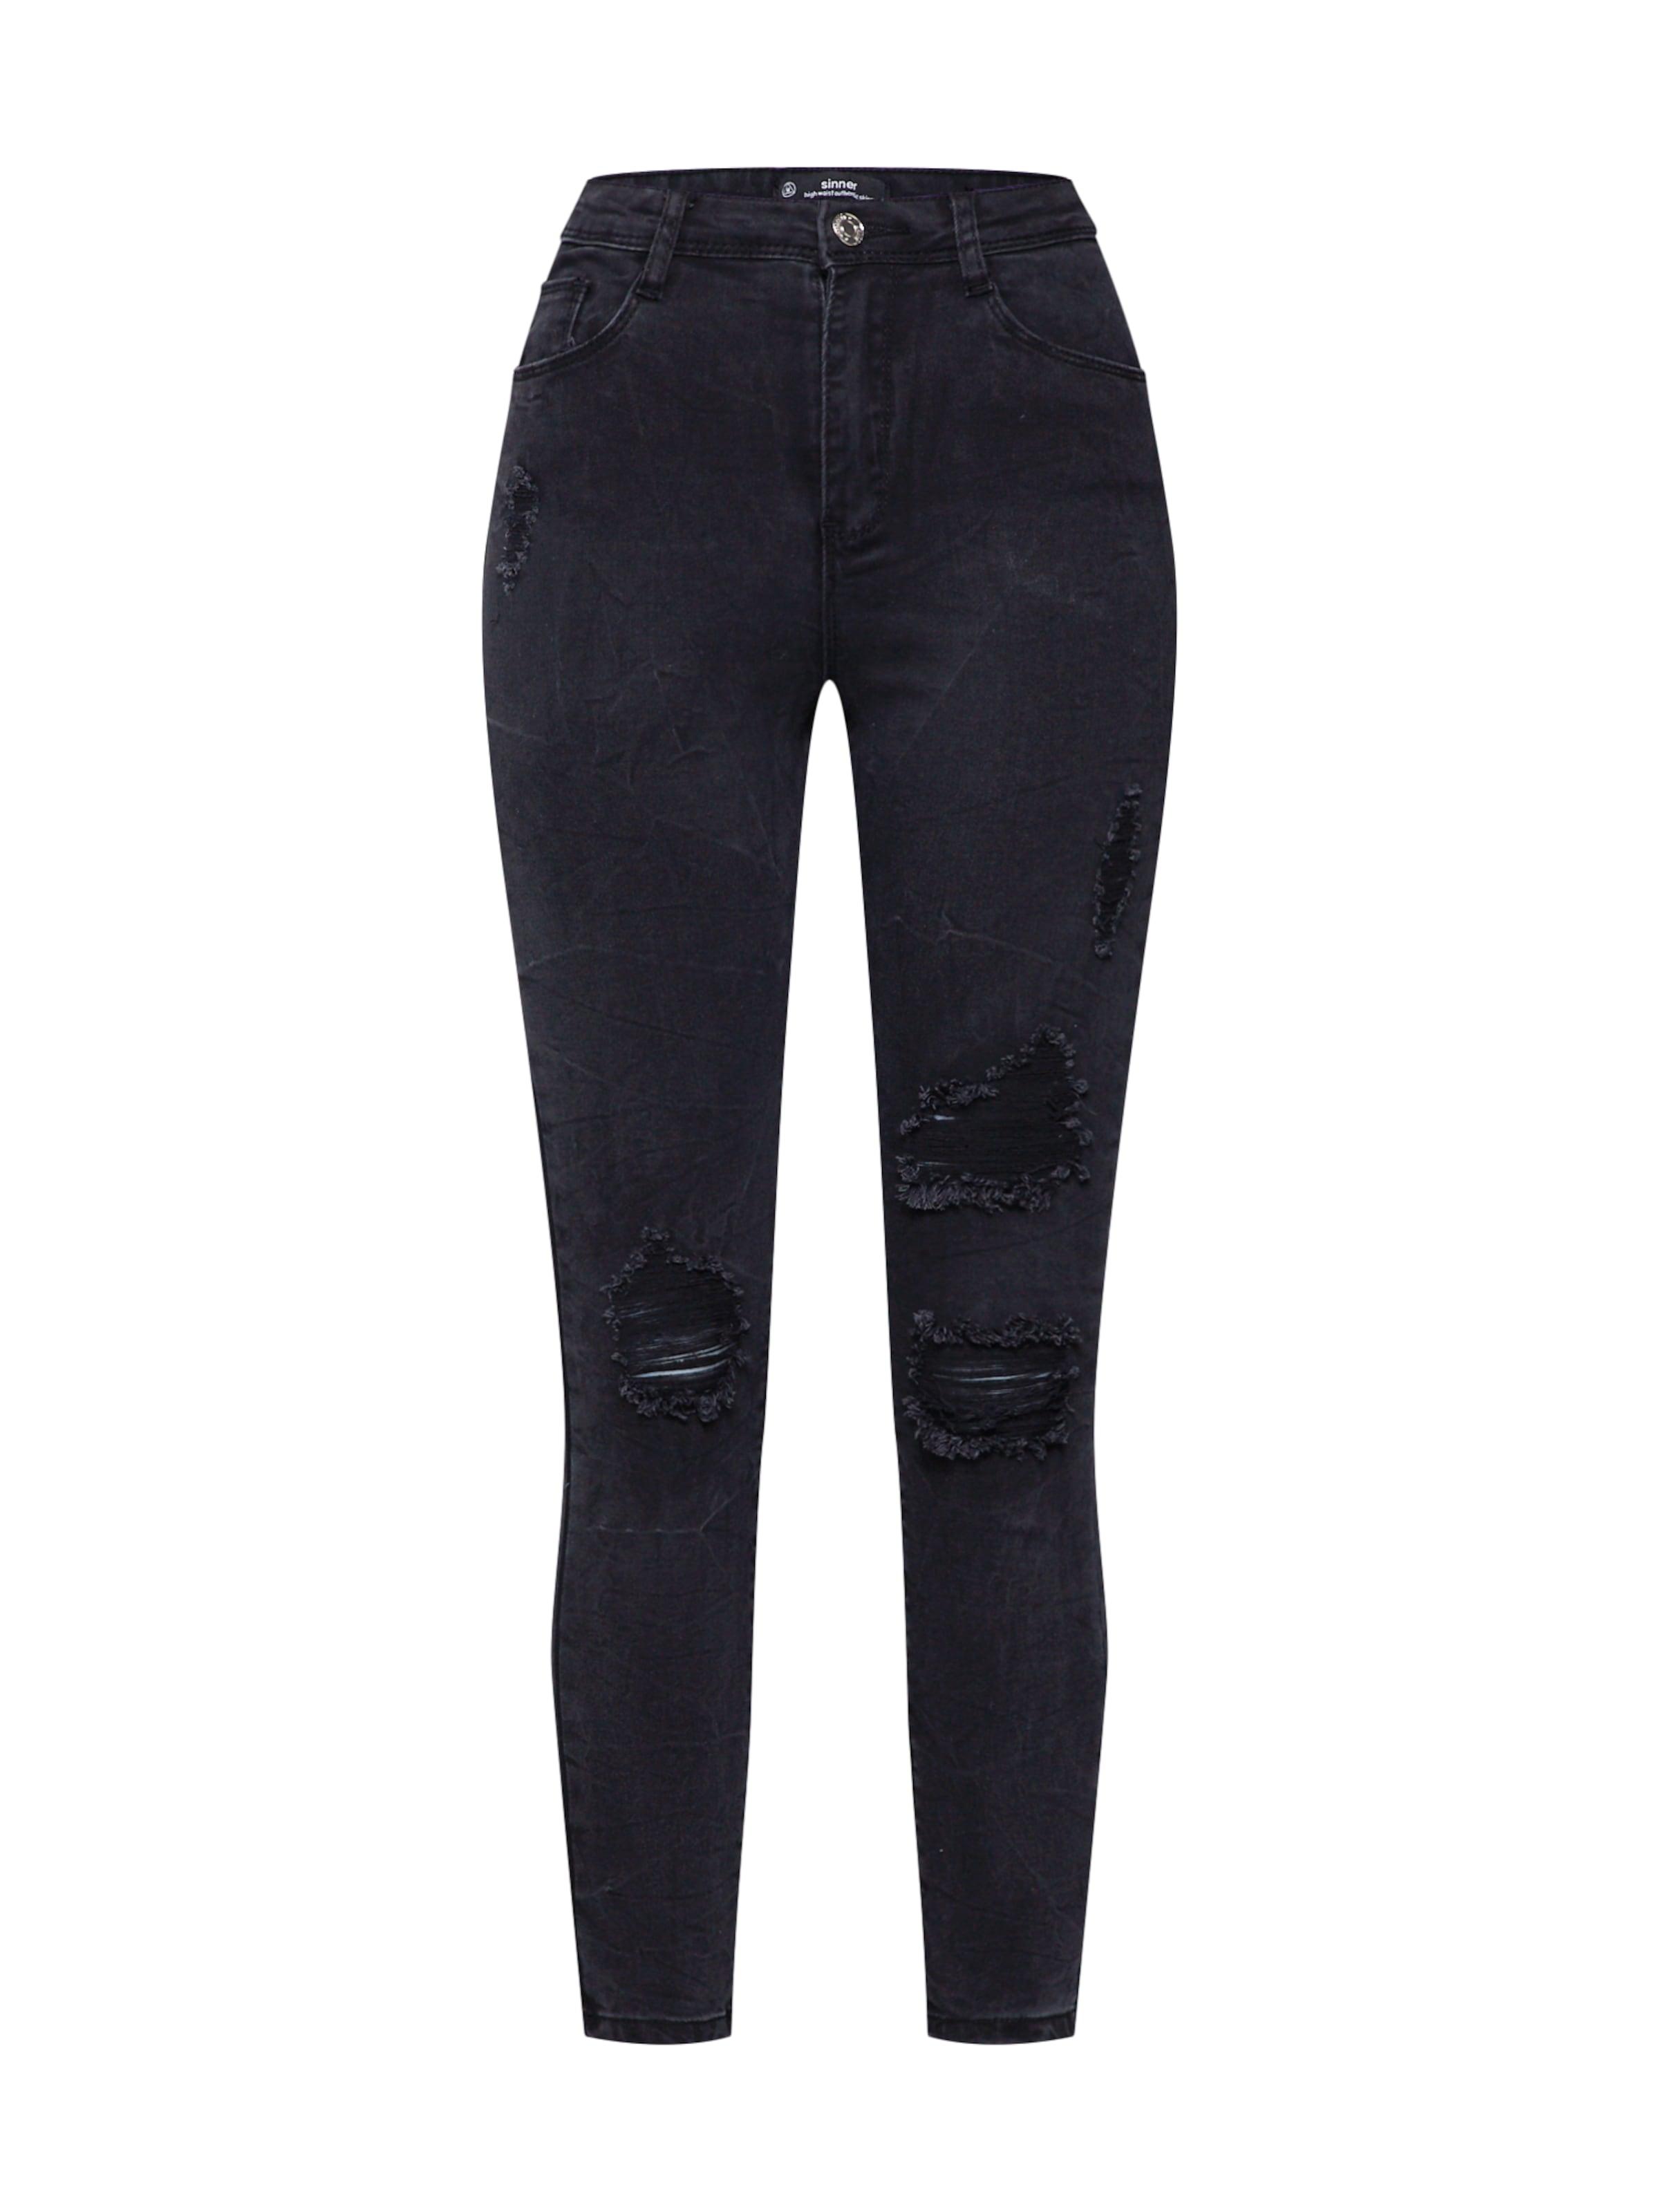 In Schwarz In Schwarz Jeans Missguided Jeans In Missguided Jeans Jeans Missguided Missguided In Schwarz vmN8w0On